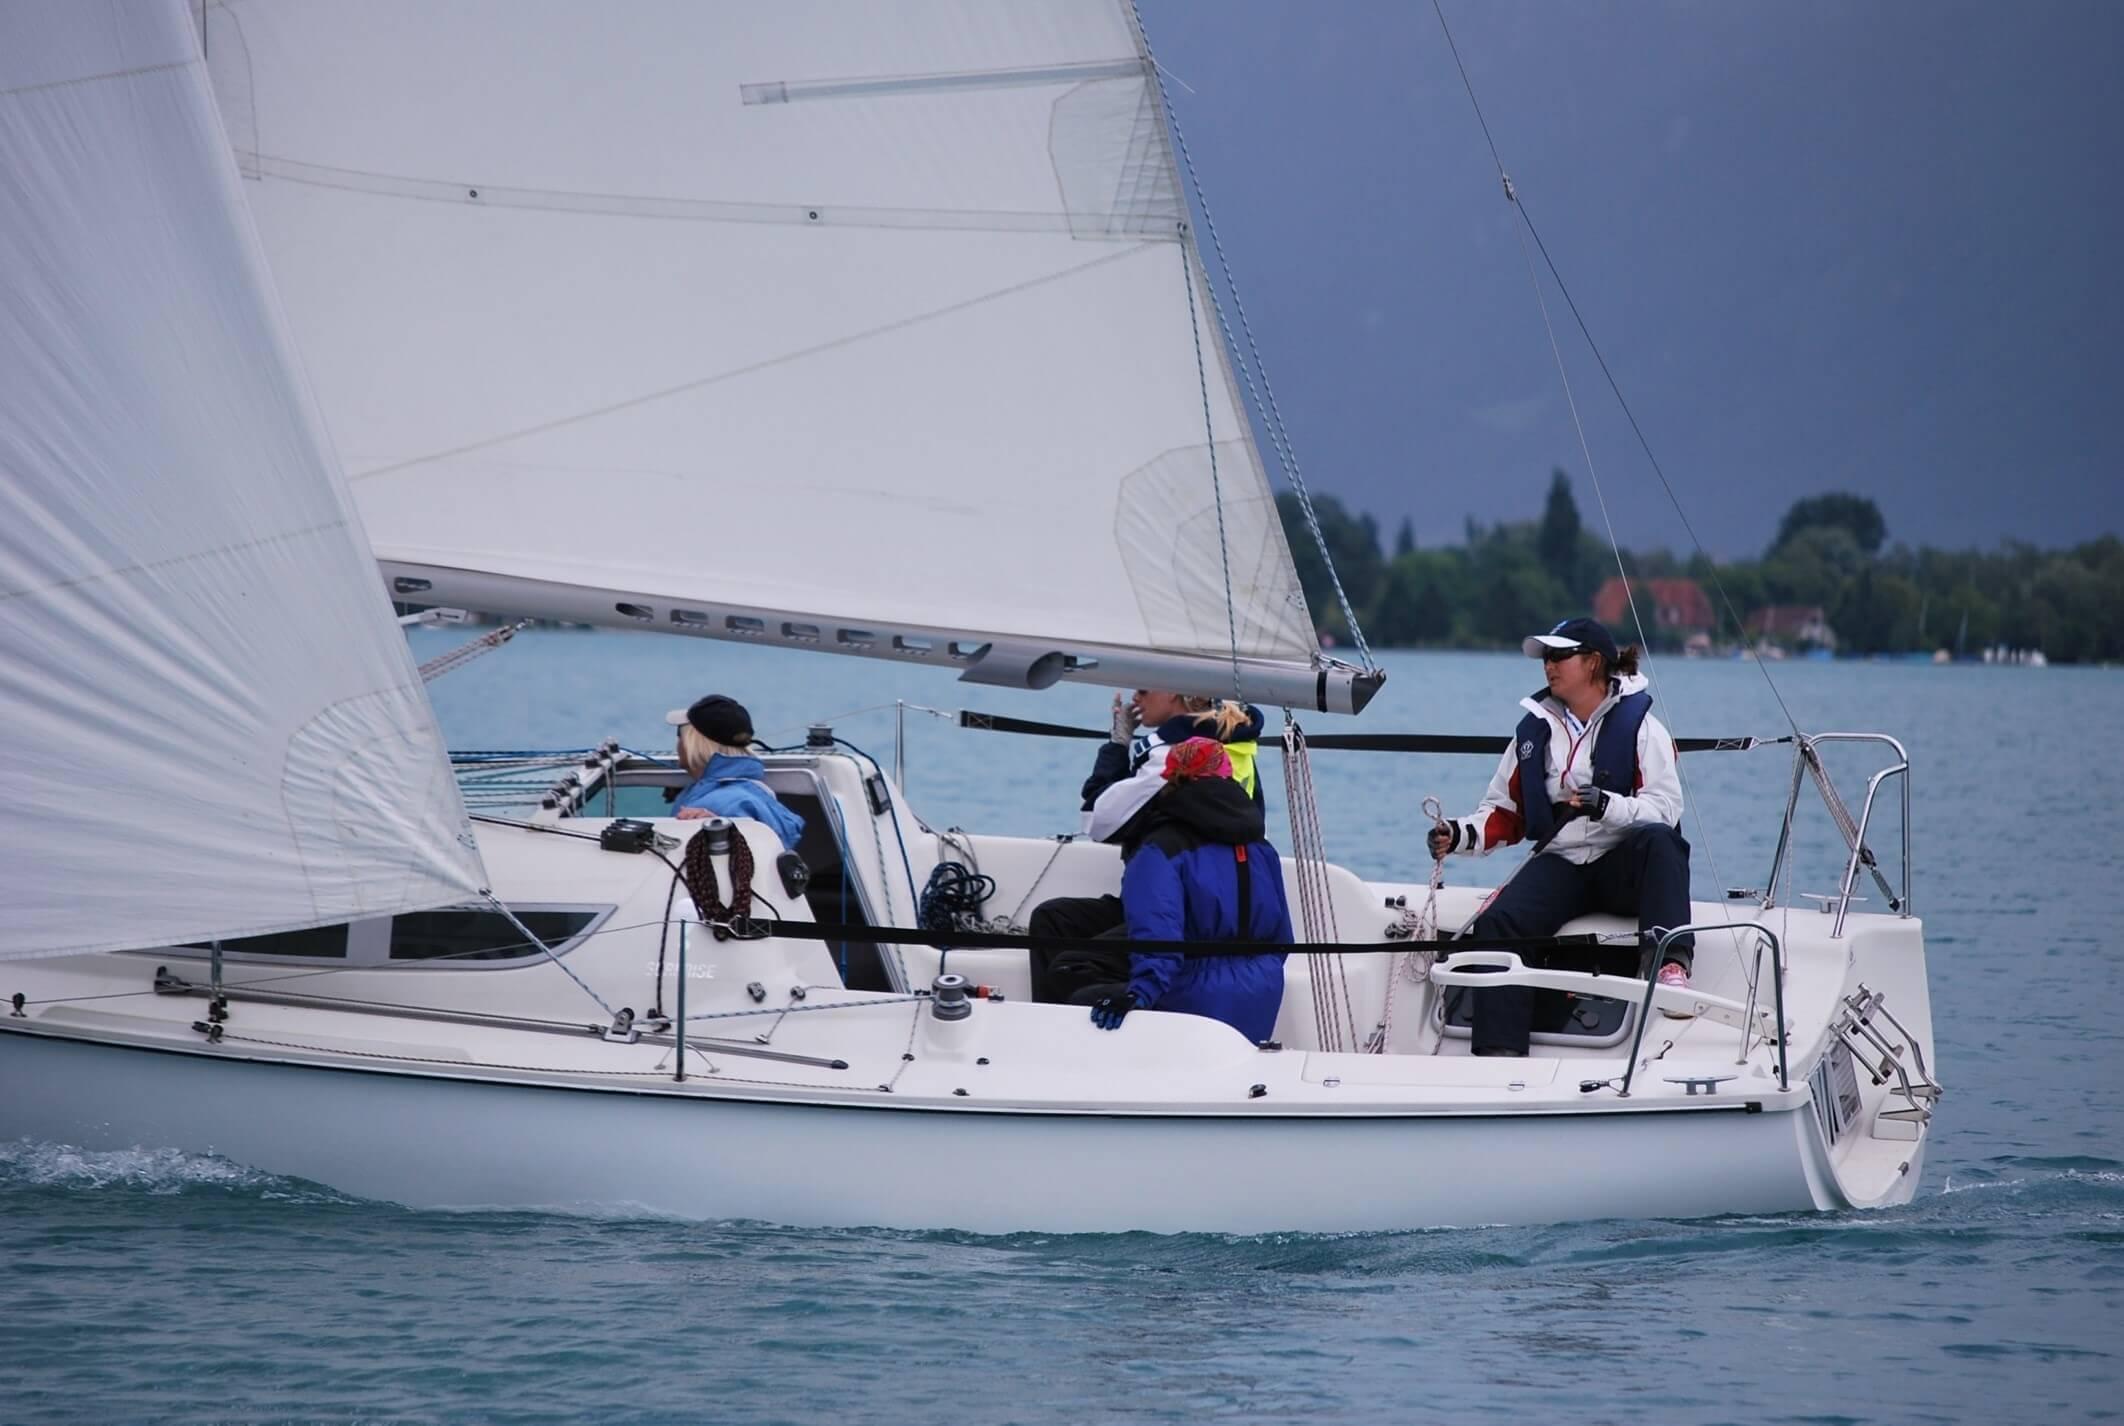 interlaken-segelschule-neuhaus-thunersee-sommer-segeln